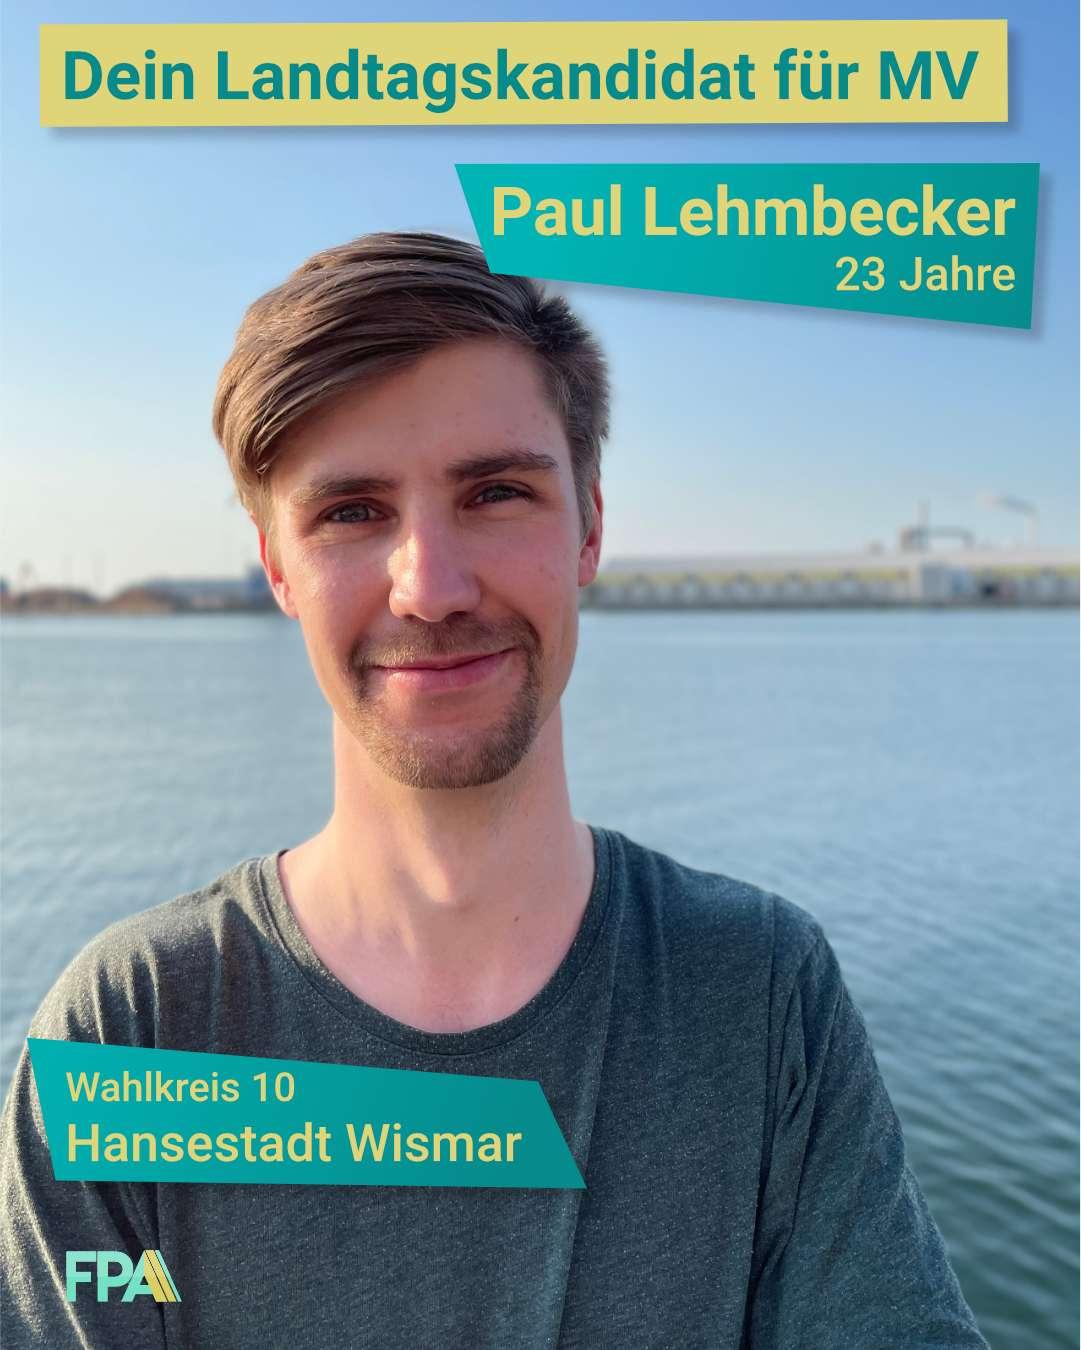 Paul Lehmbecker